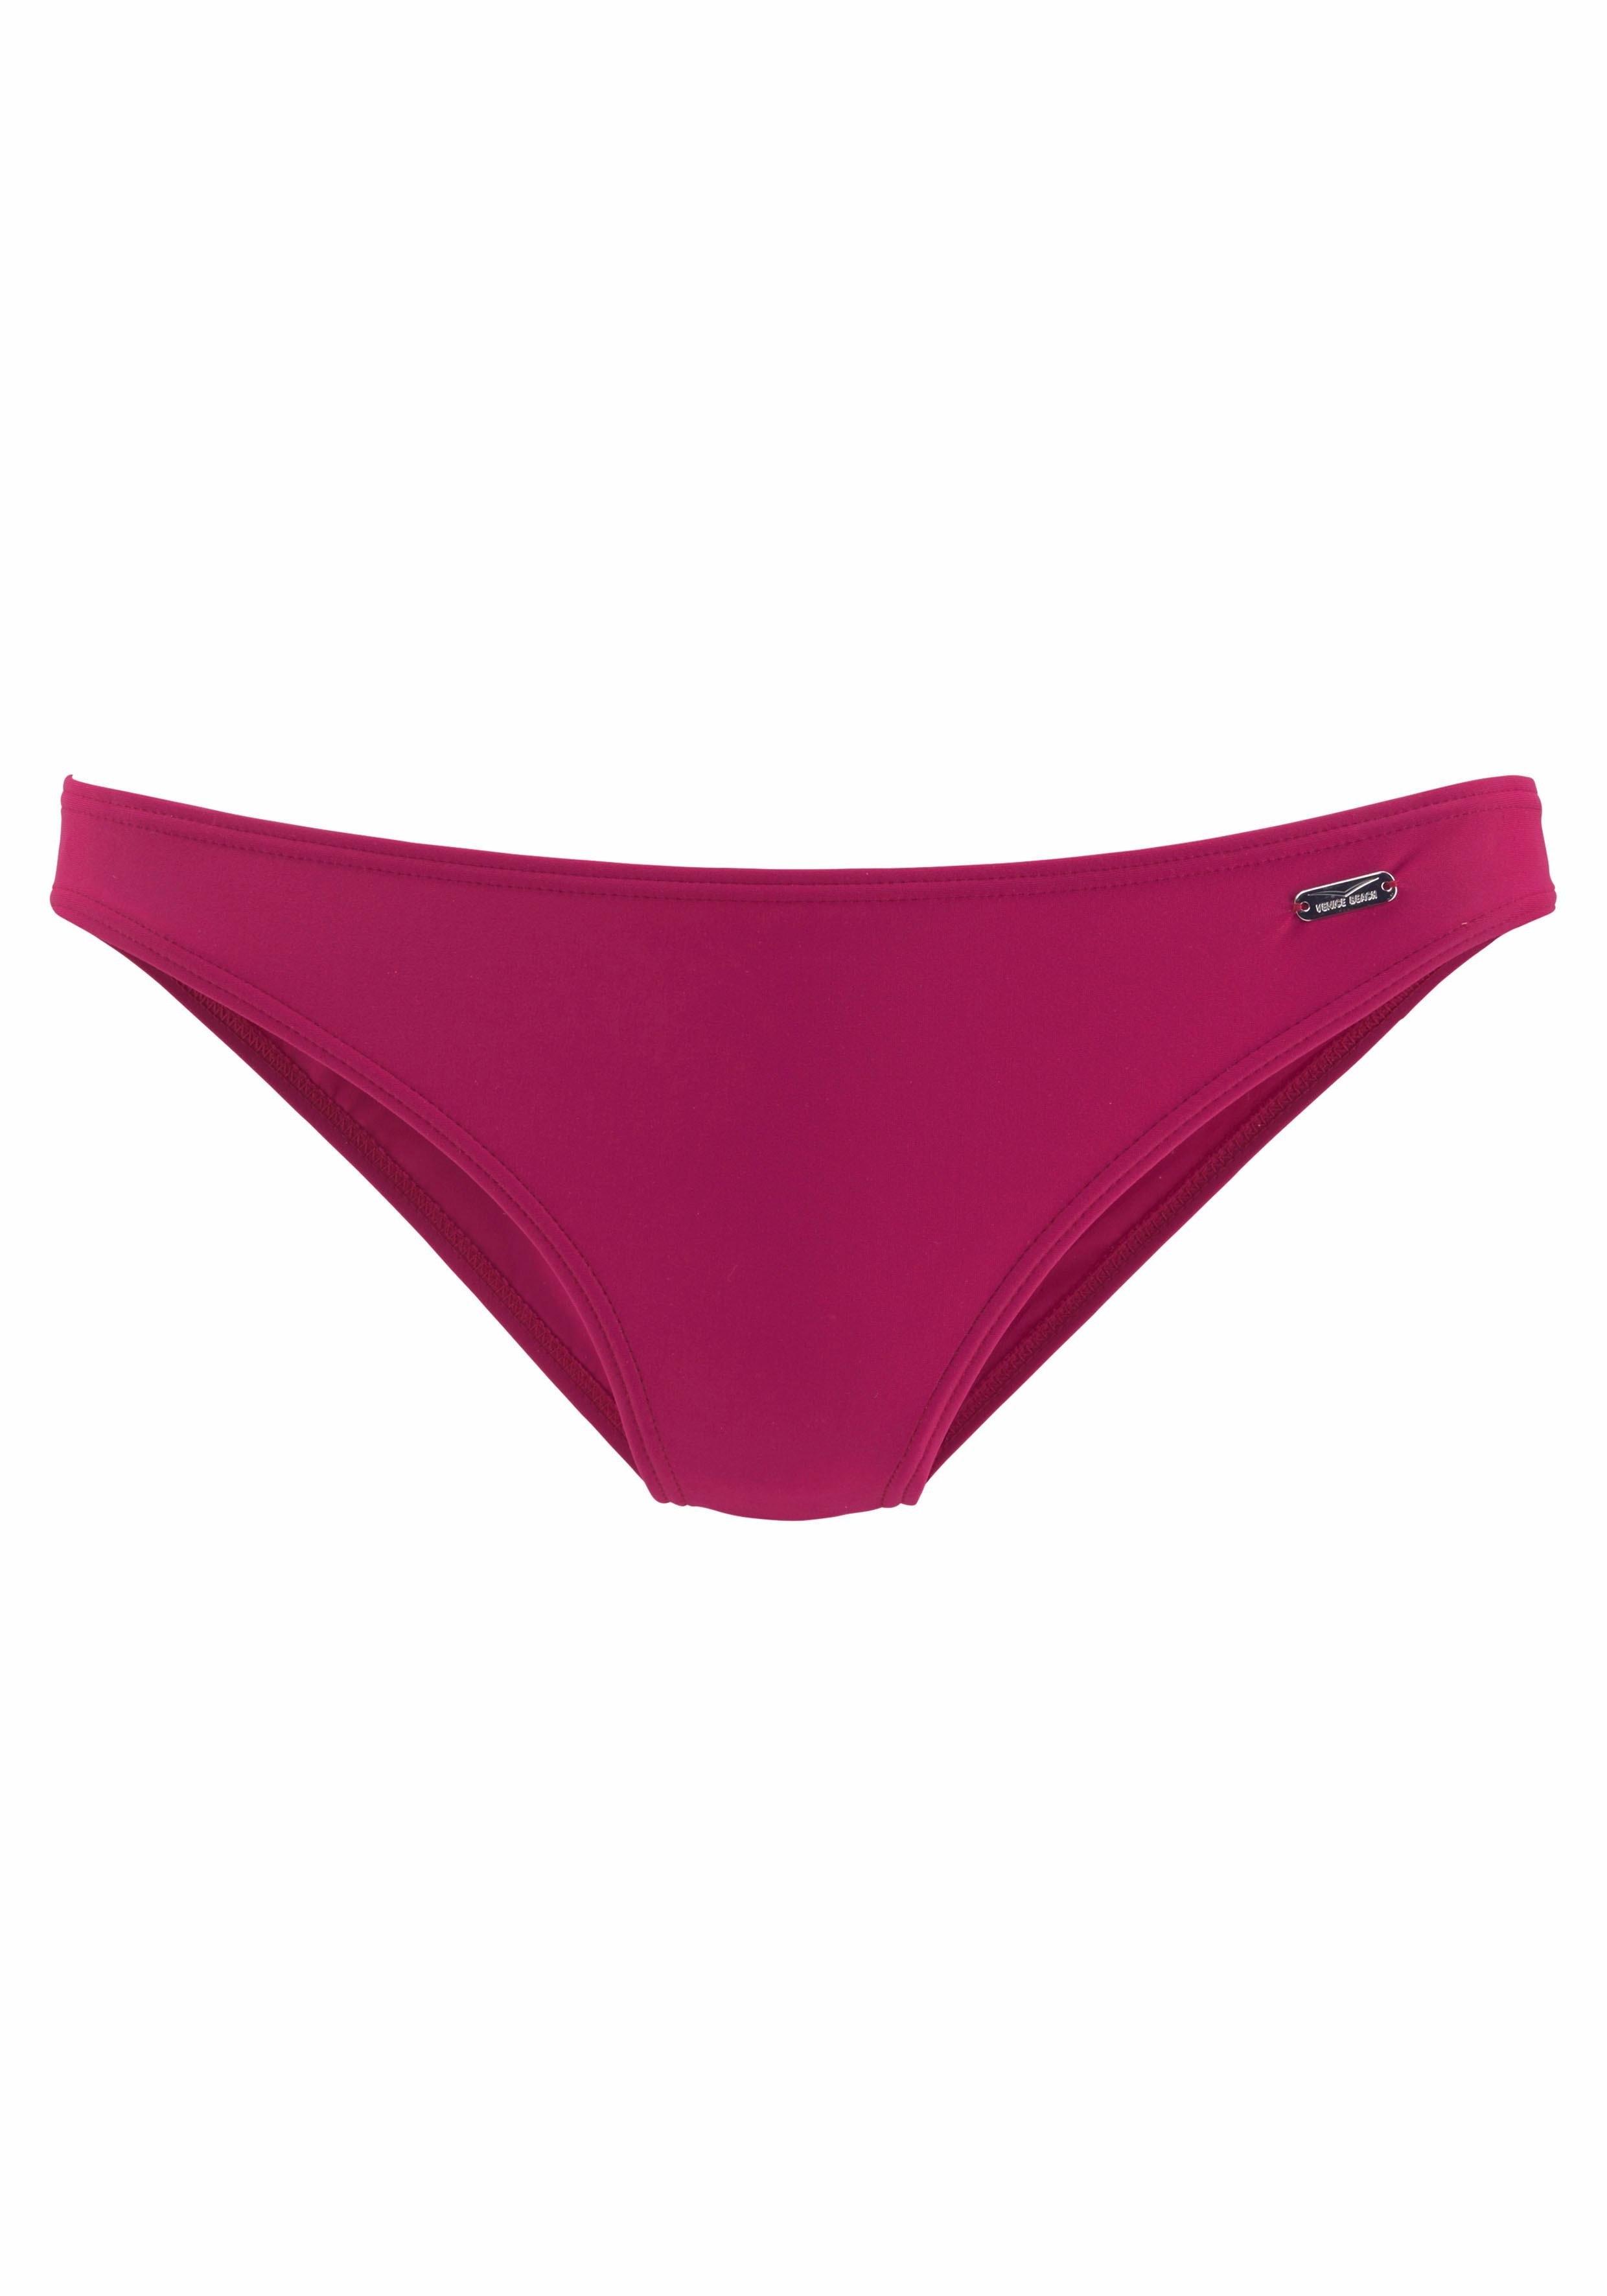 VENICE BEACH Bikinibroekje Spring bij Lascana online kopen